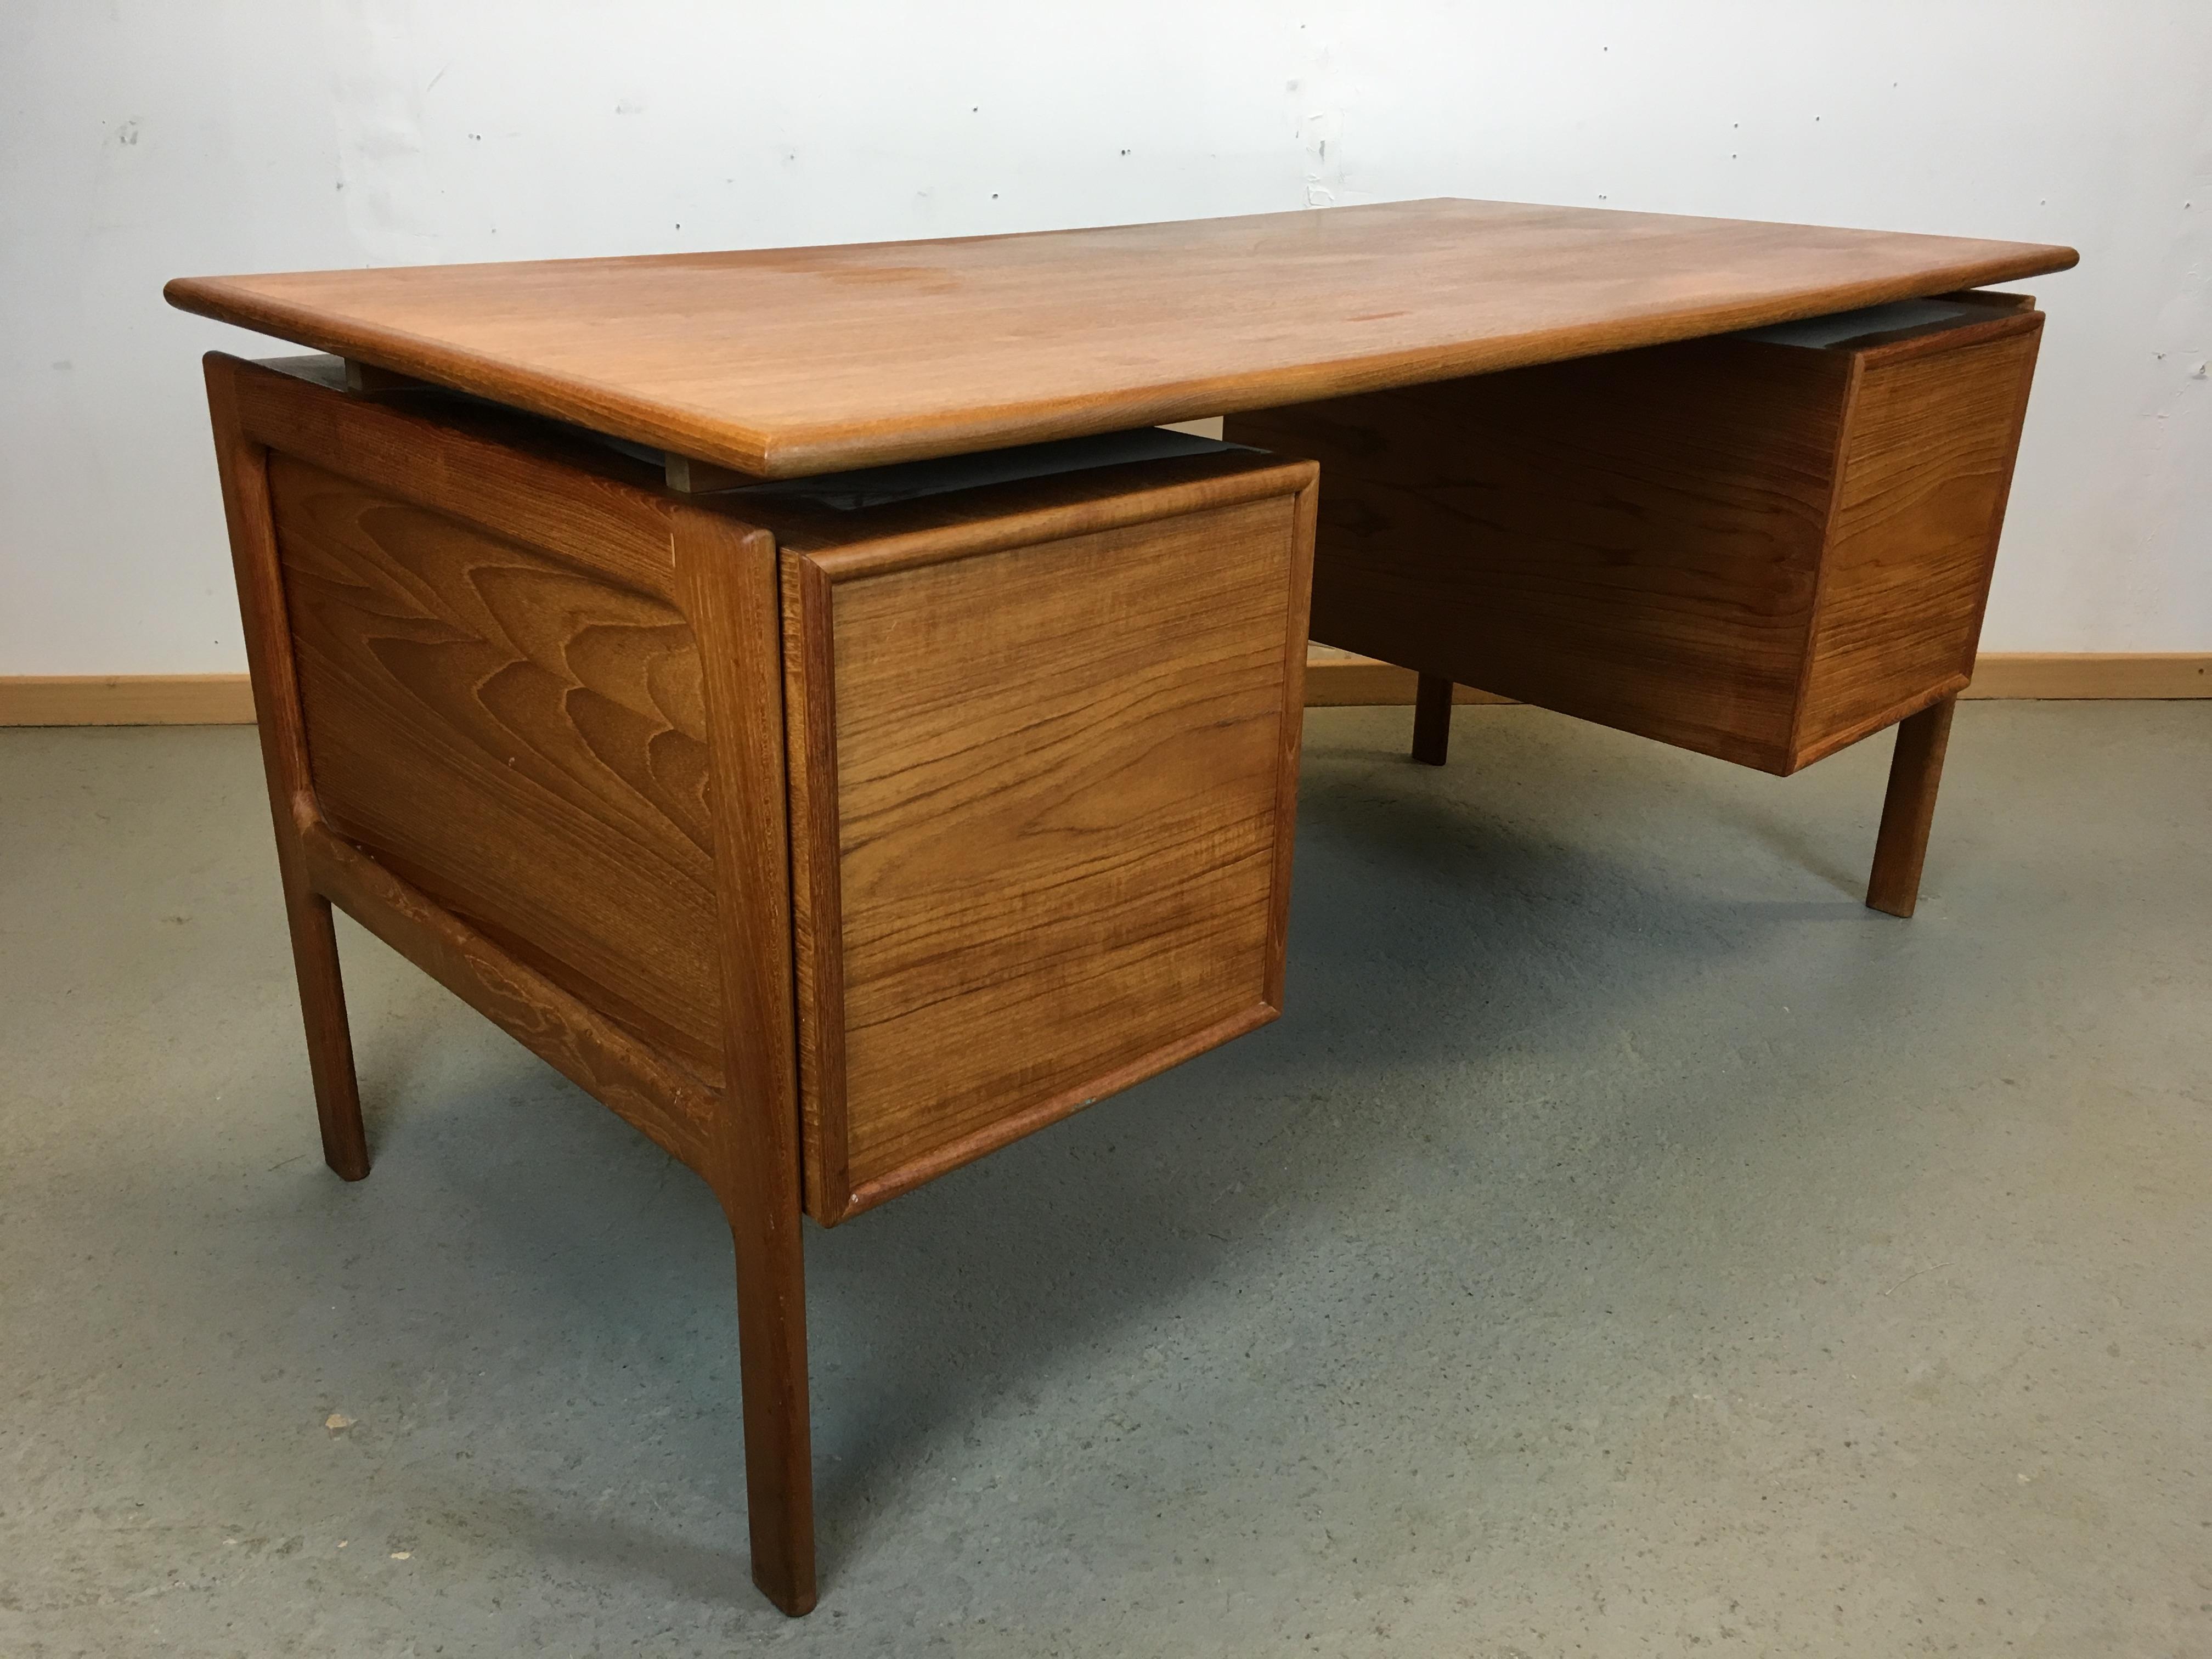 bureau scandinave annee 70 desk danish